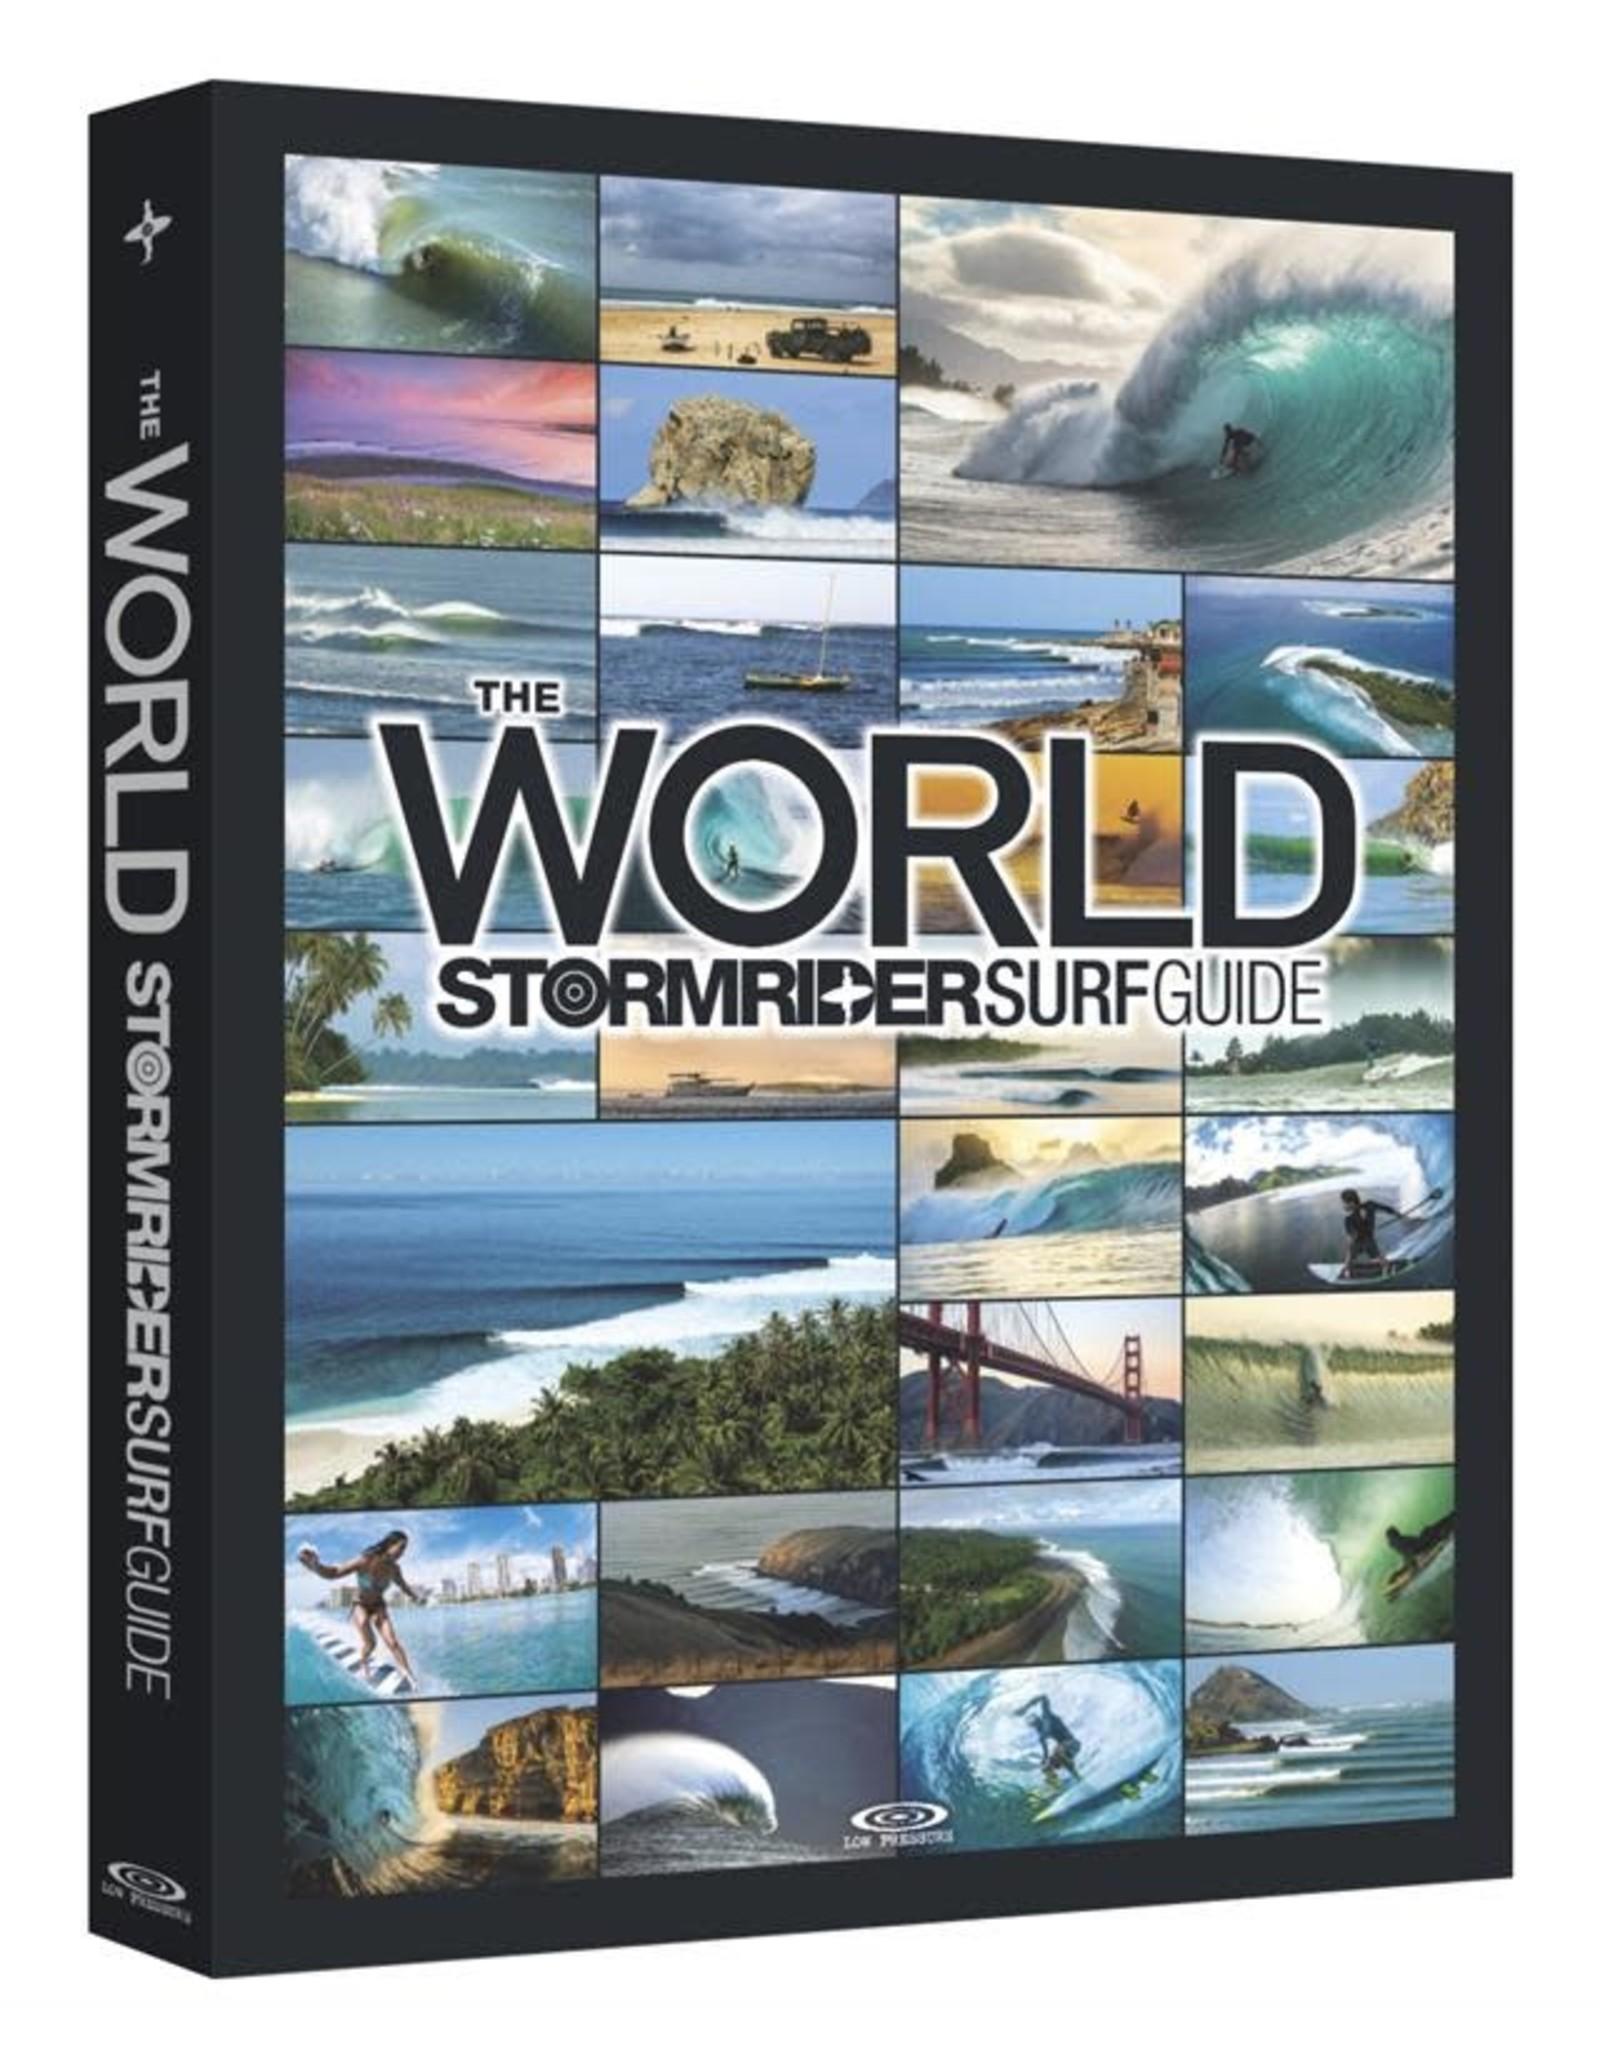 Stormrider The World Stormrider Surf Guide